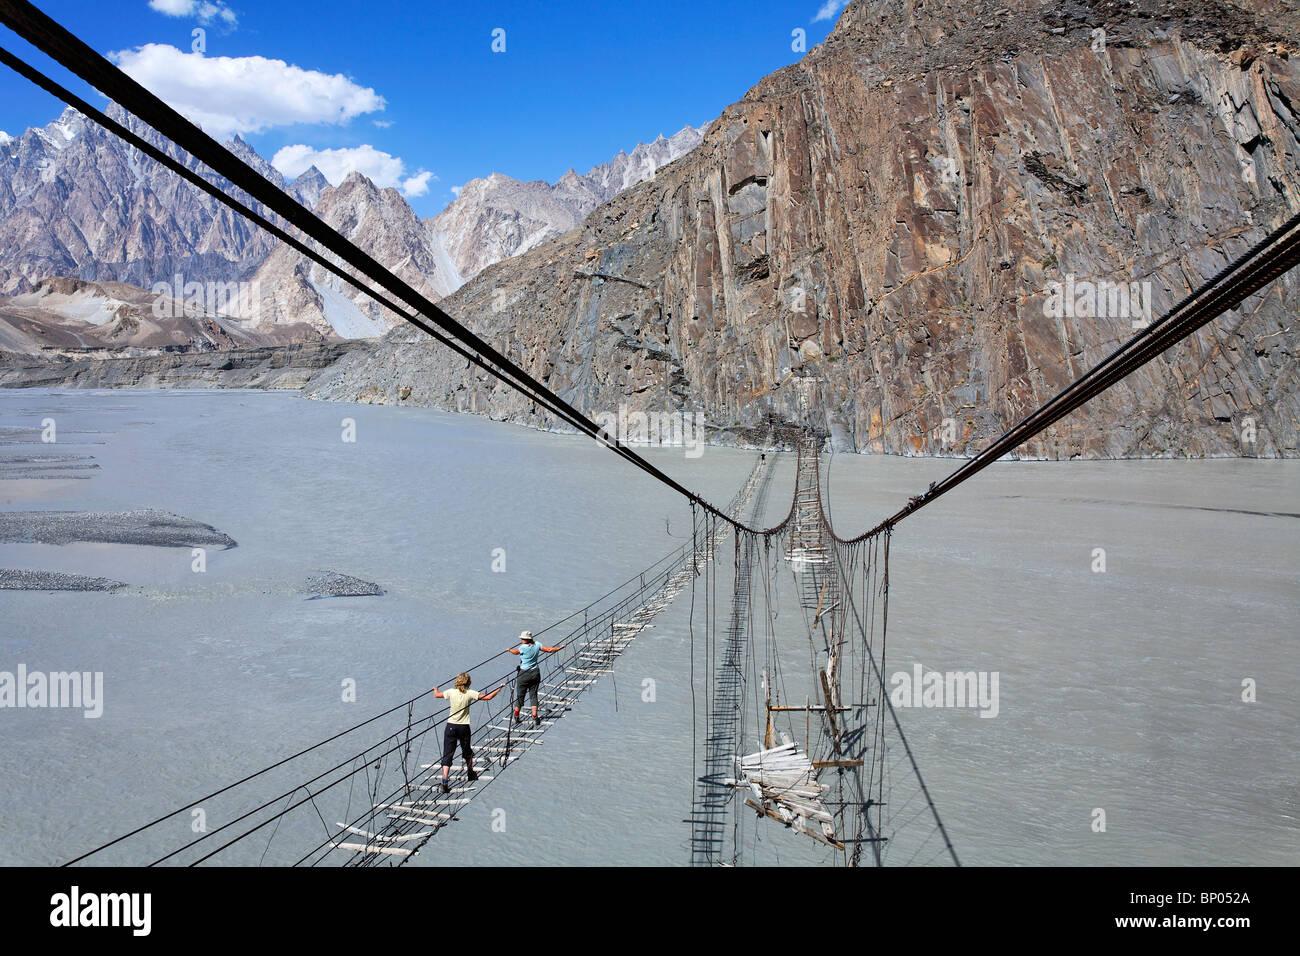 Pakistan - Karakorum - Hunza Valley - tourists crossing a suspension bridge across the Hunza River Stock Photo